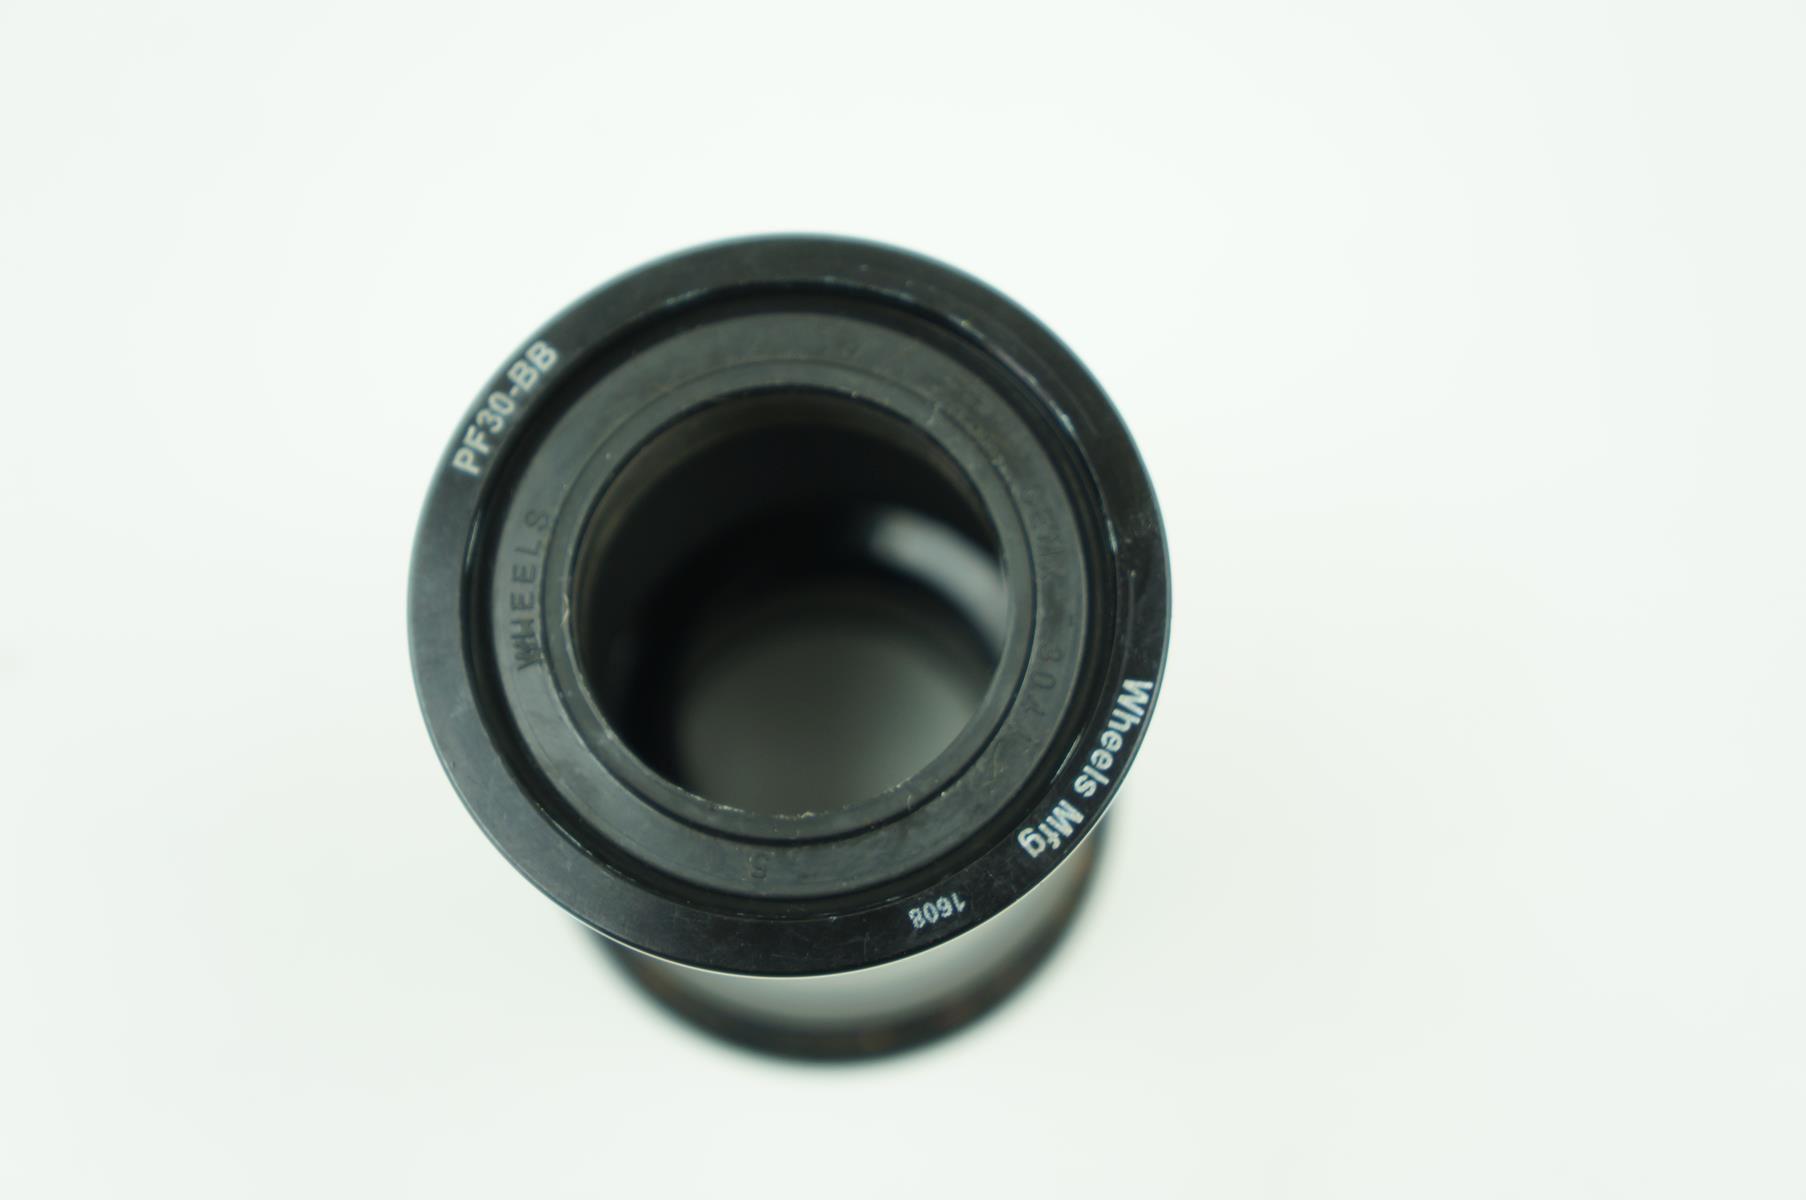 Movimento Central Wheels MFG Pressfit 30 Mtb 46mm por 68-73mm - USADO